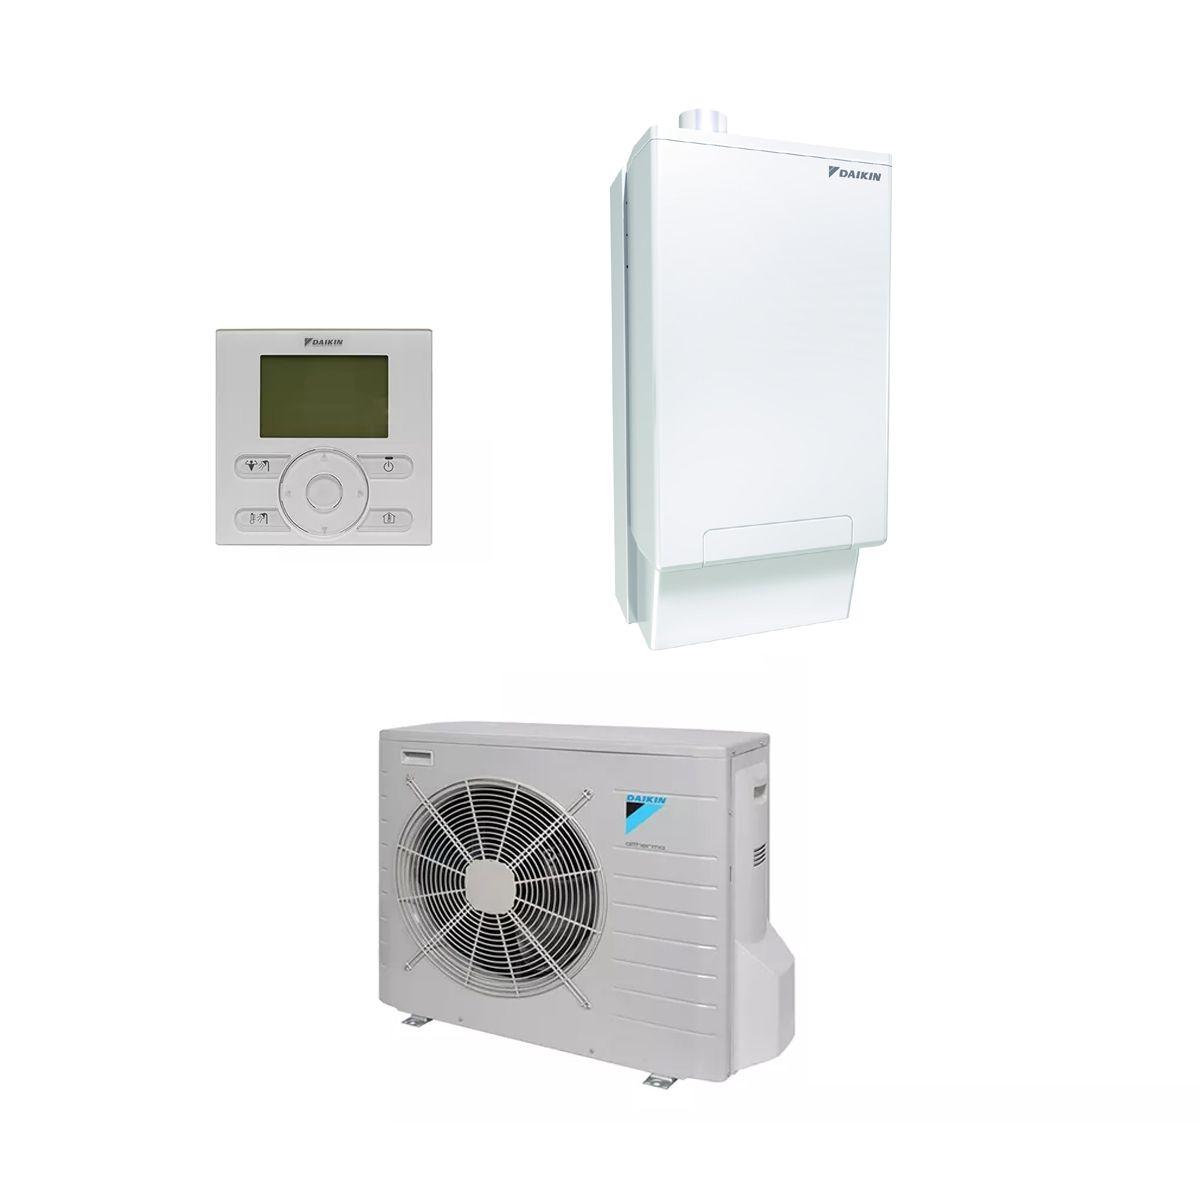 Daikin Evlq Cv3 Hybrid Heat Pump Boiler System